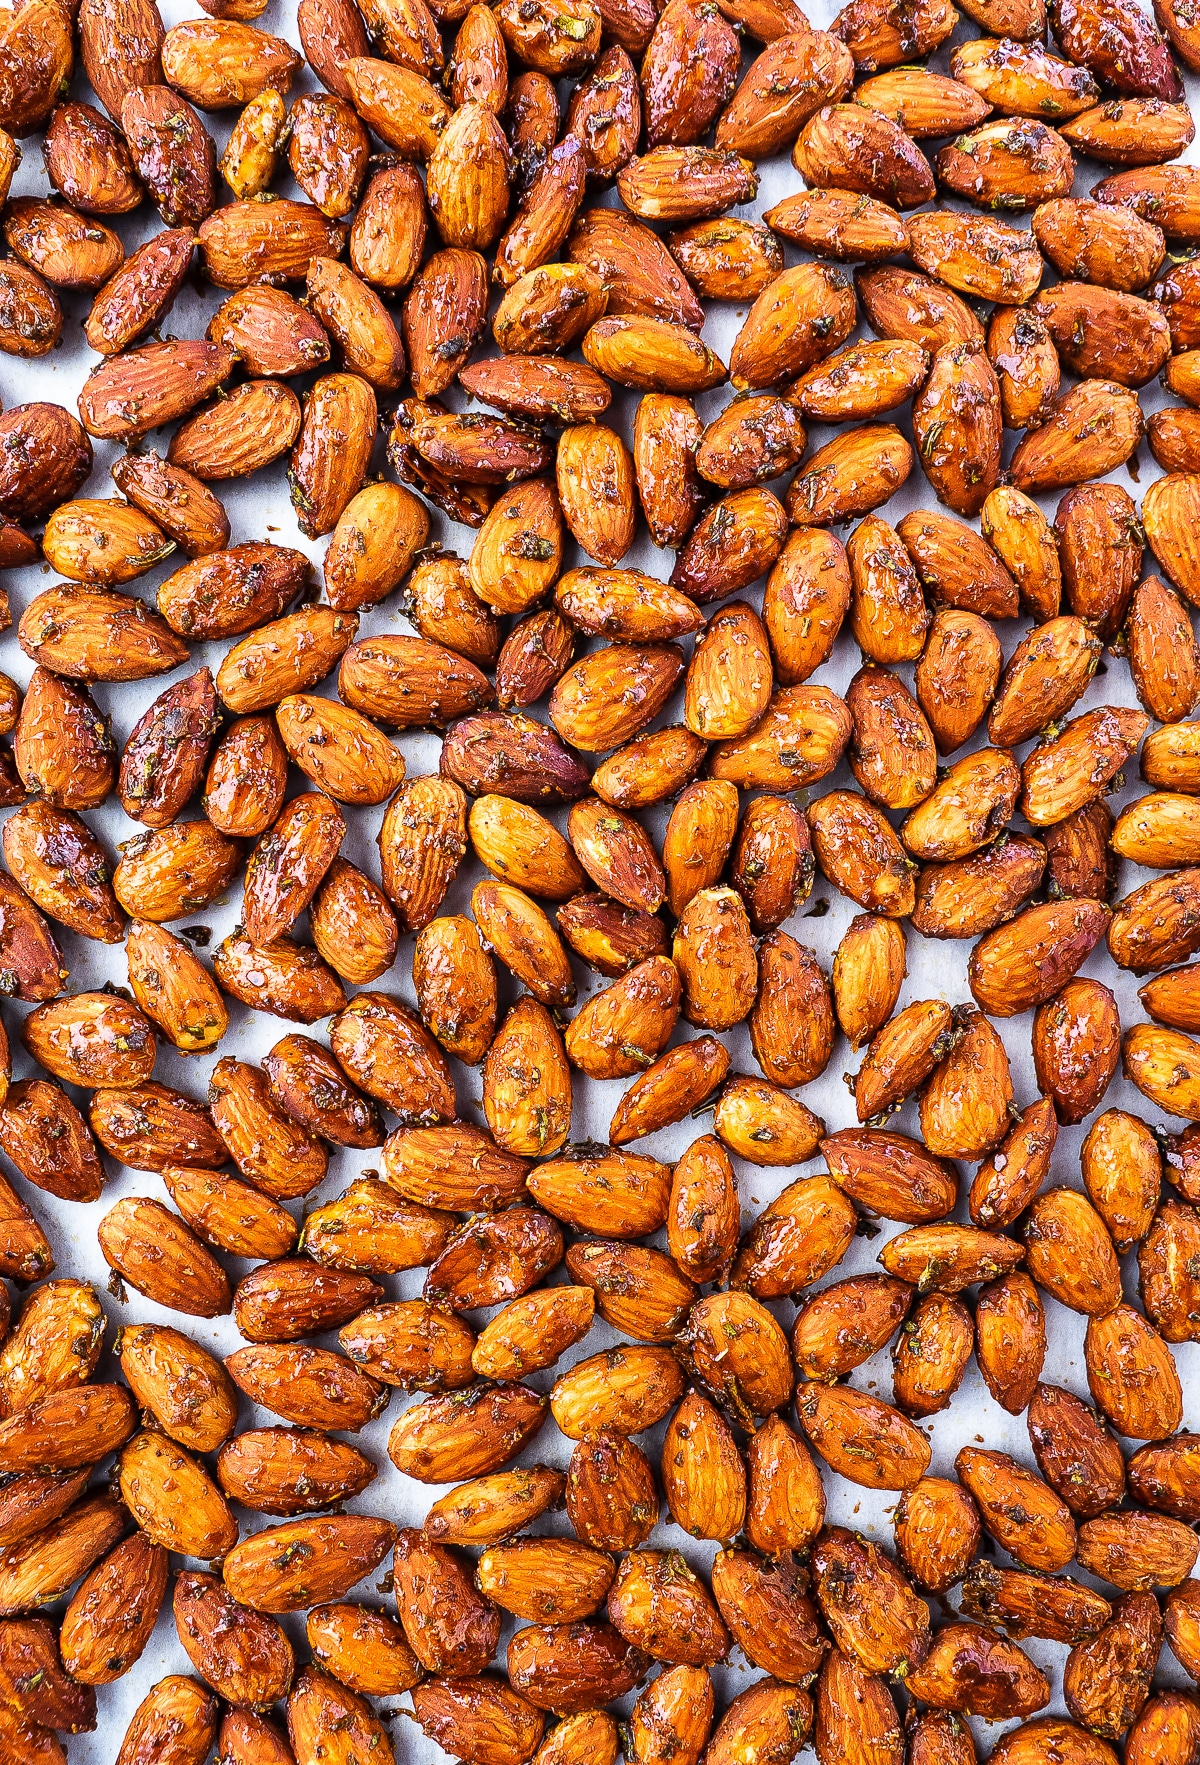 Tray of freshly roasted almonds.